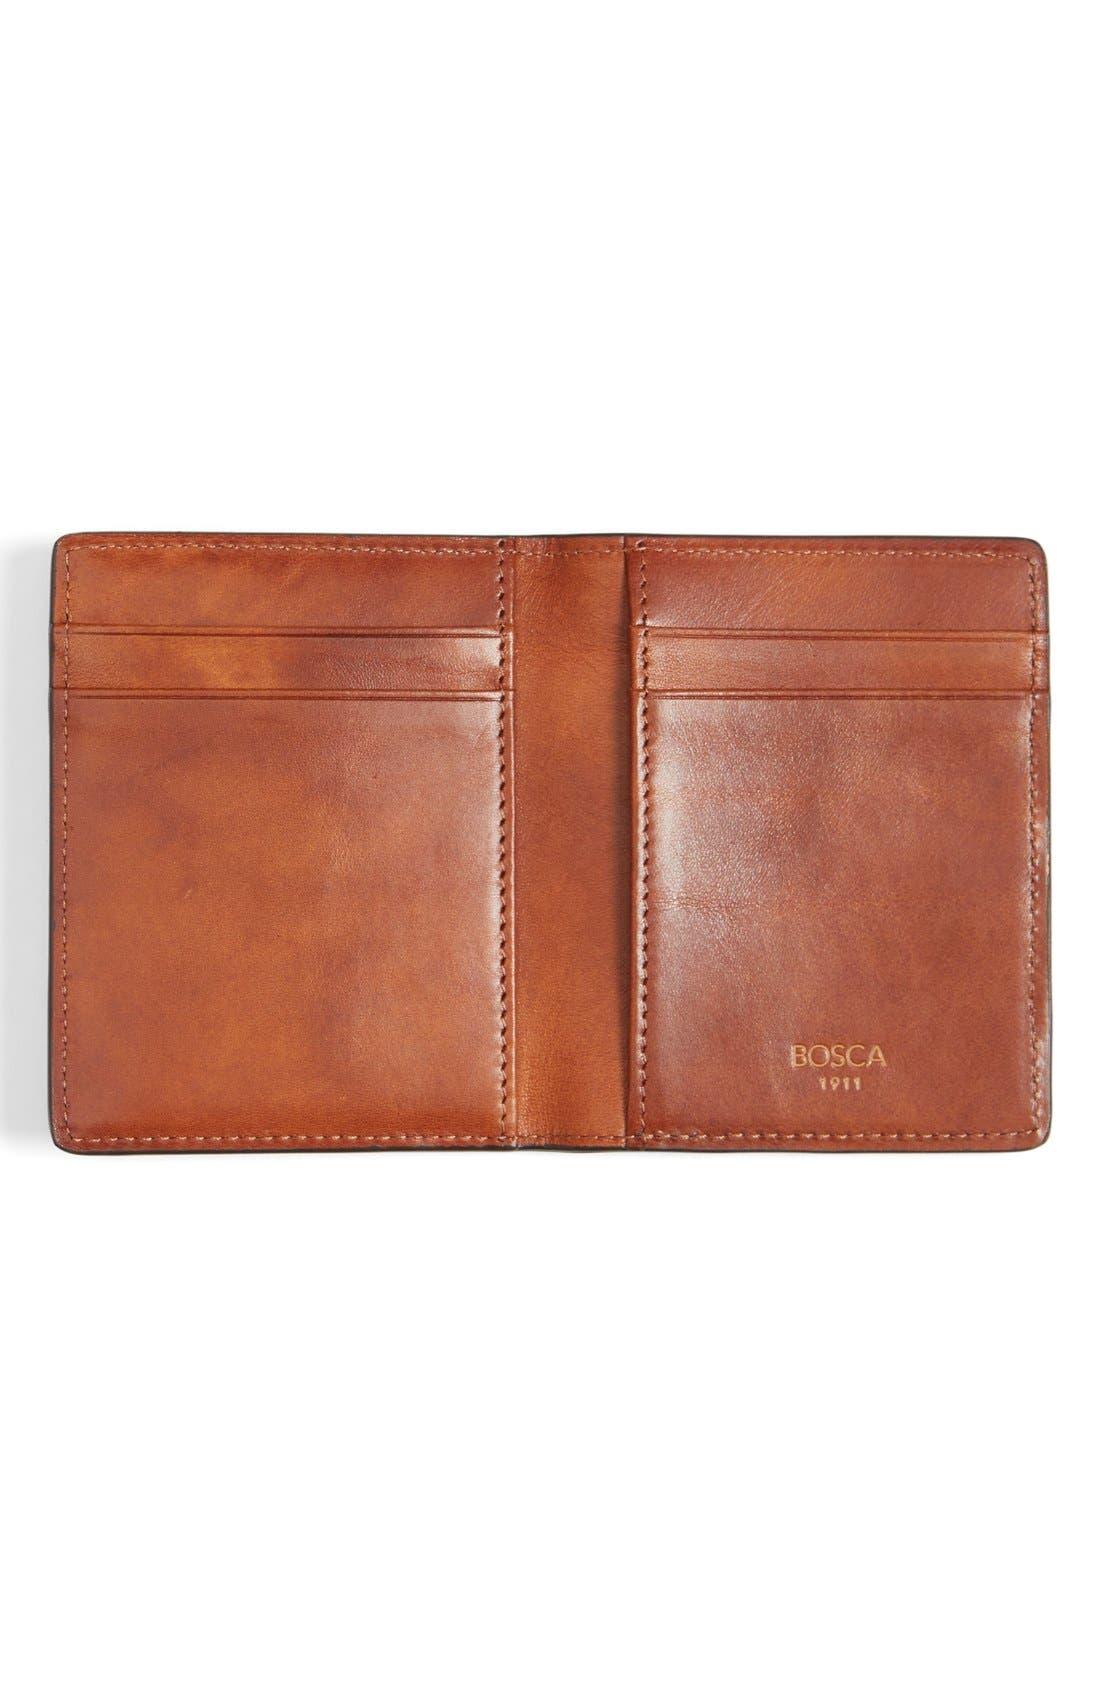 Leather Front Pocket Money Clip Wallet,                             Alternate thumbnail 2, color,                             Amber